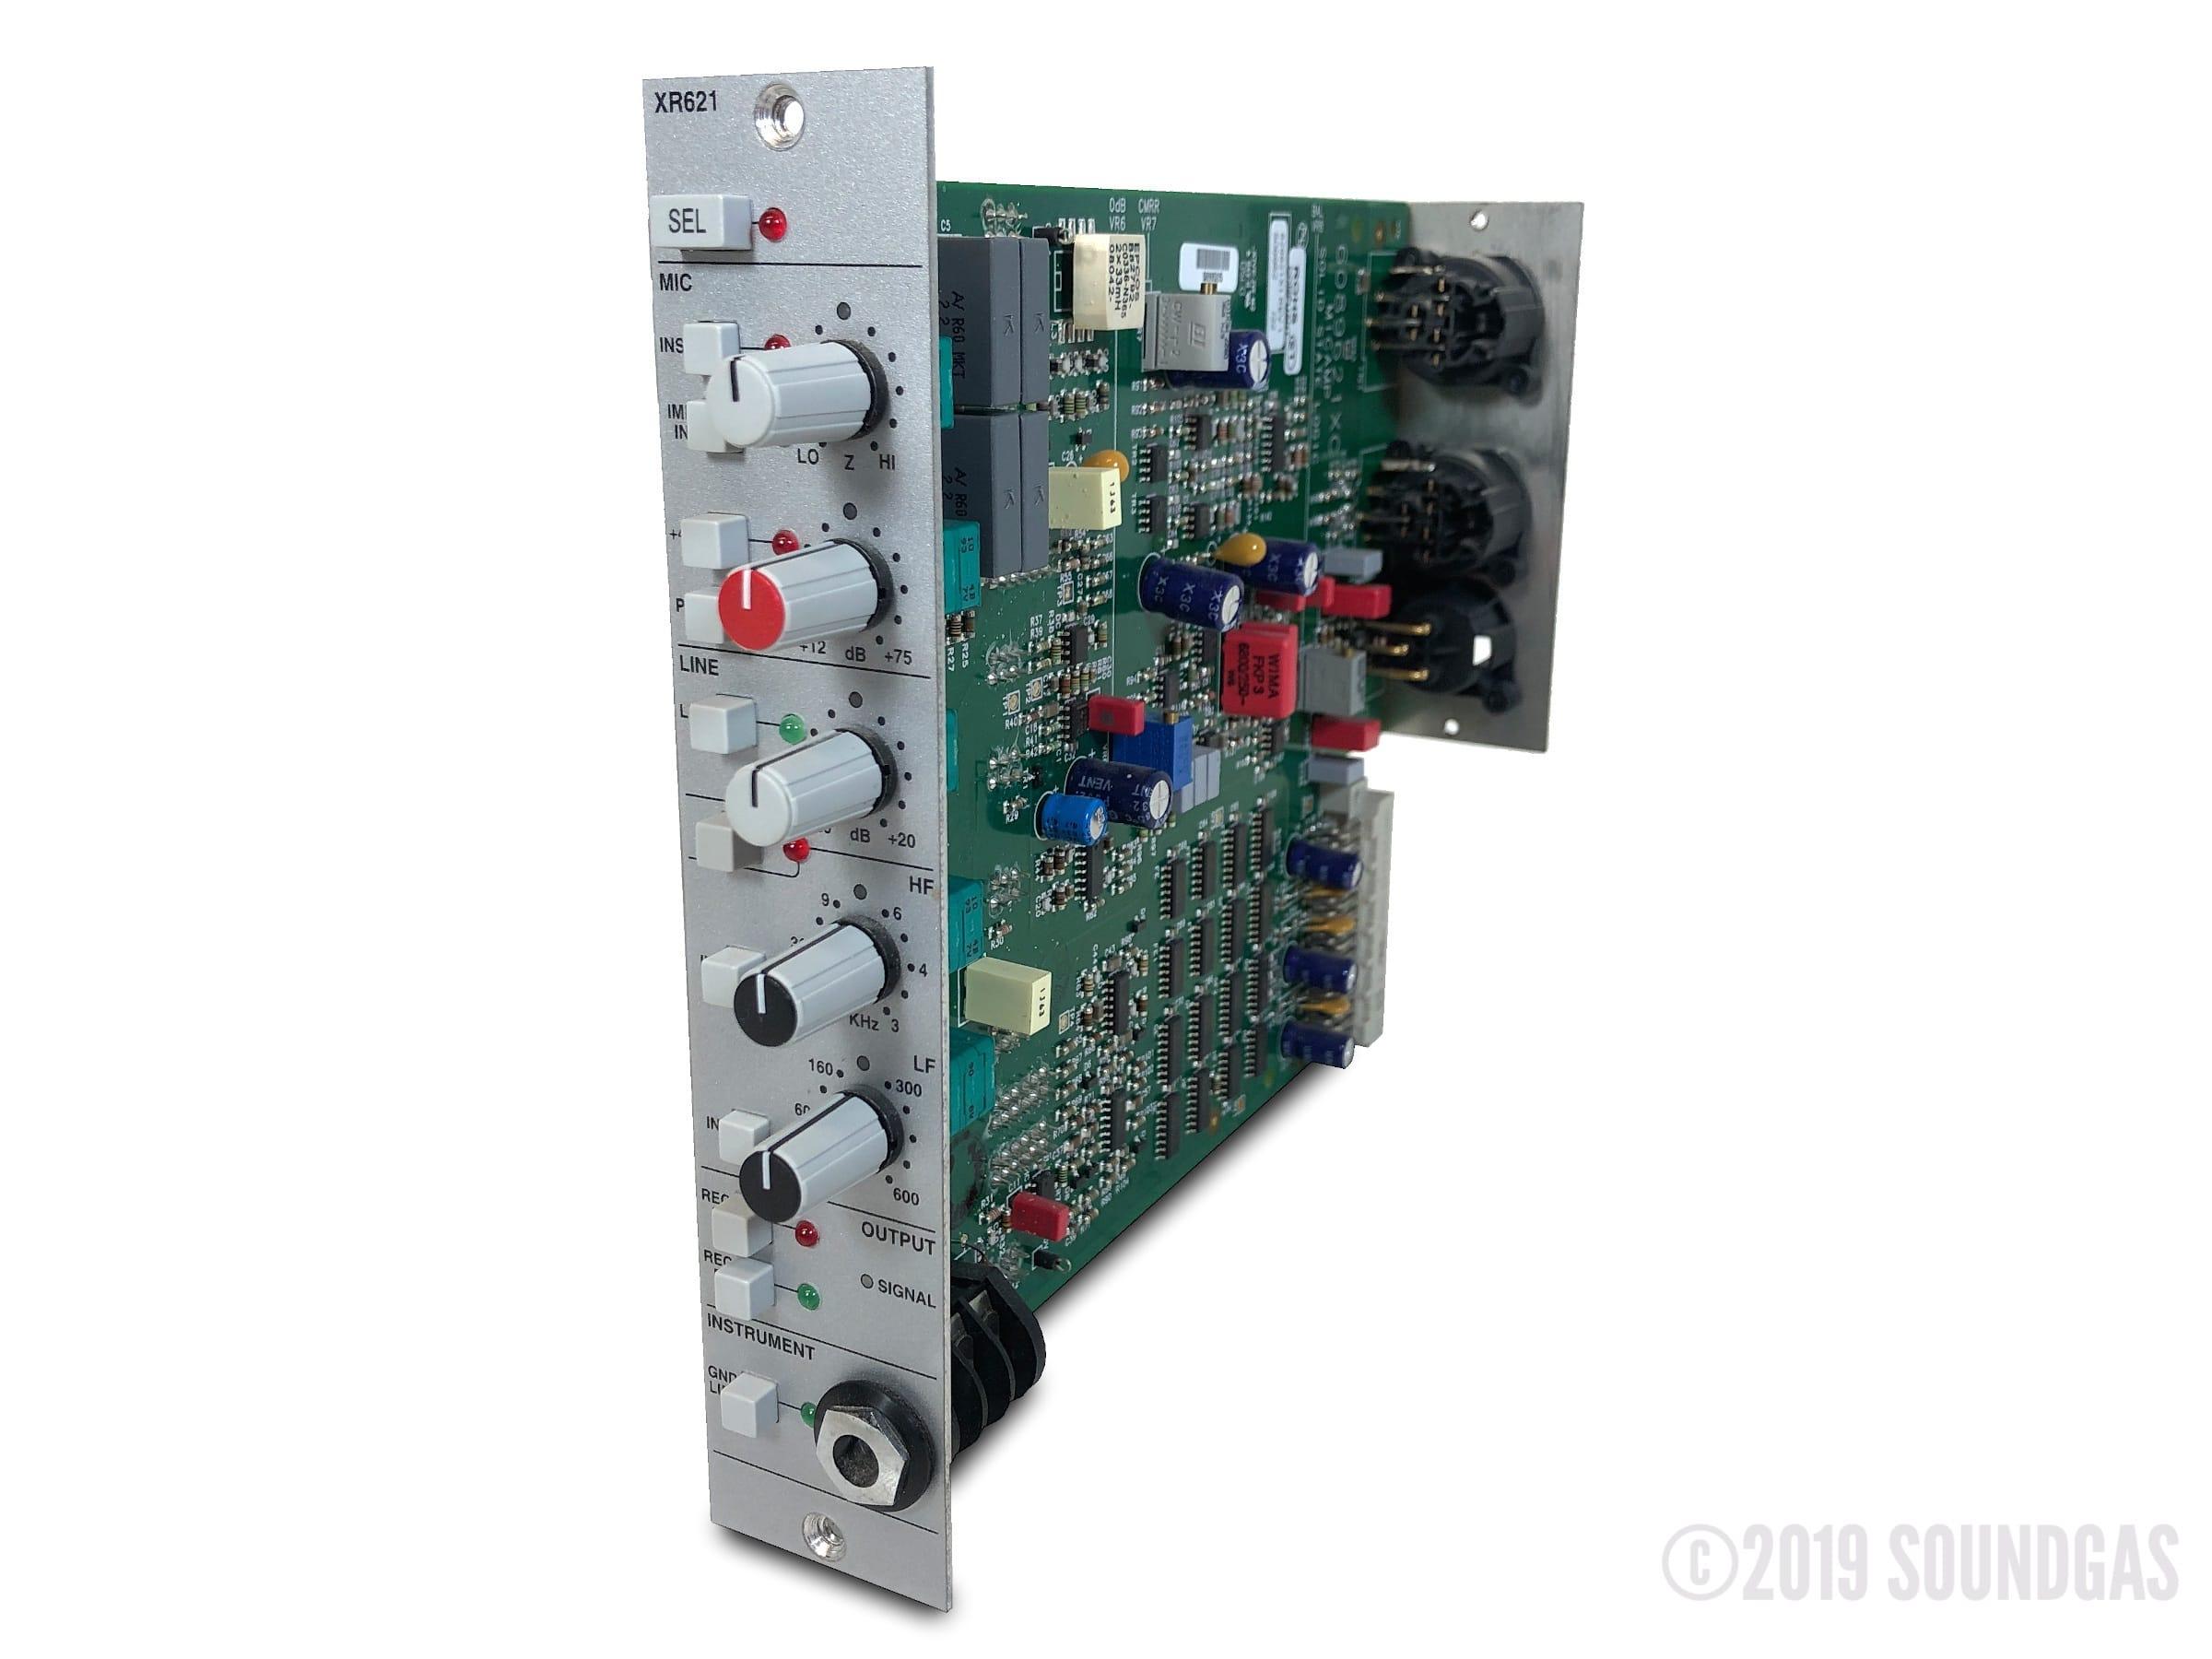 SSL-XR621-Rack-Unit-SN22-Cover-2